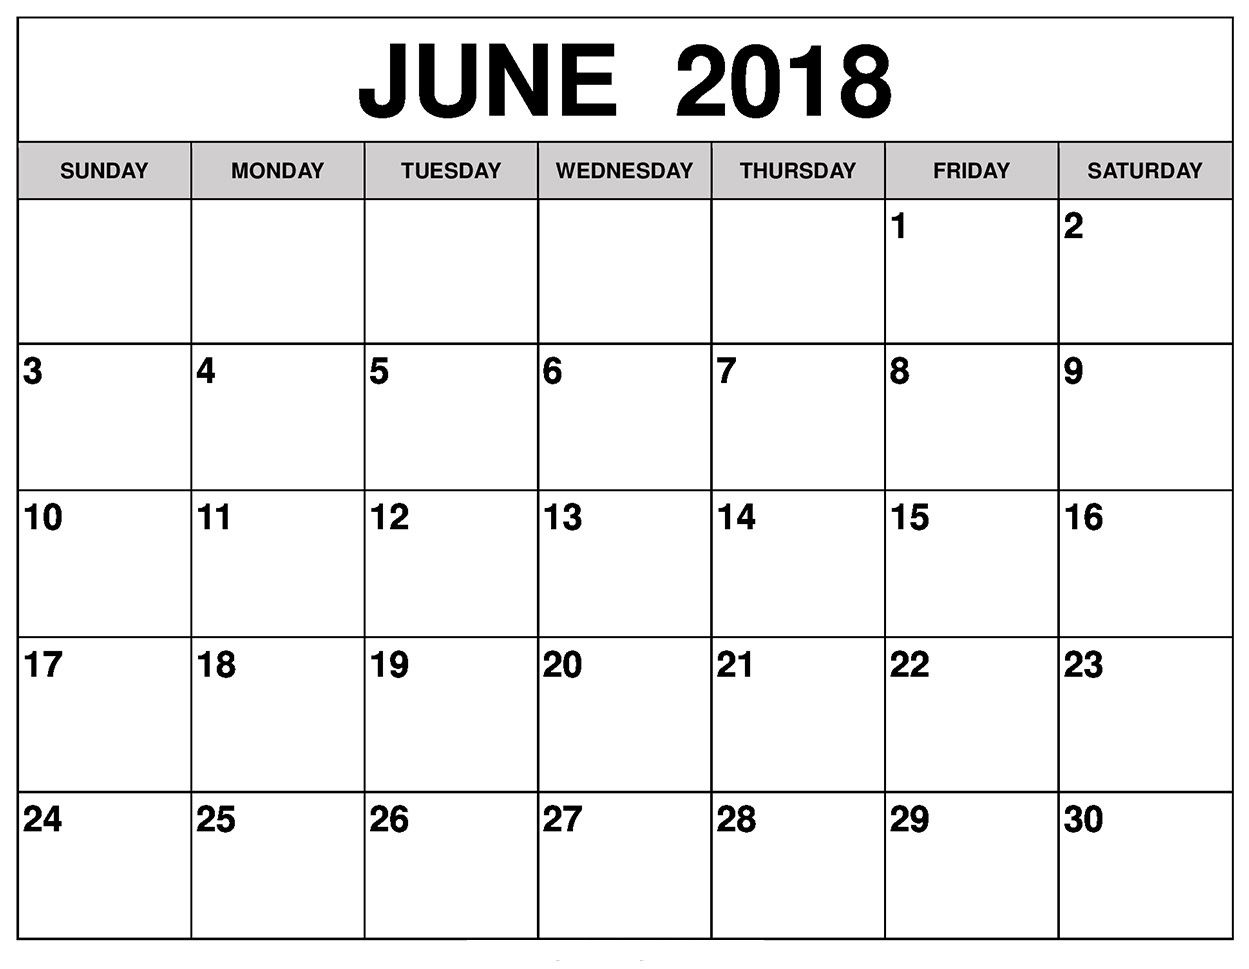 June 2018 Calendar June 2018 Calendar June Calendar Printable